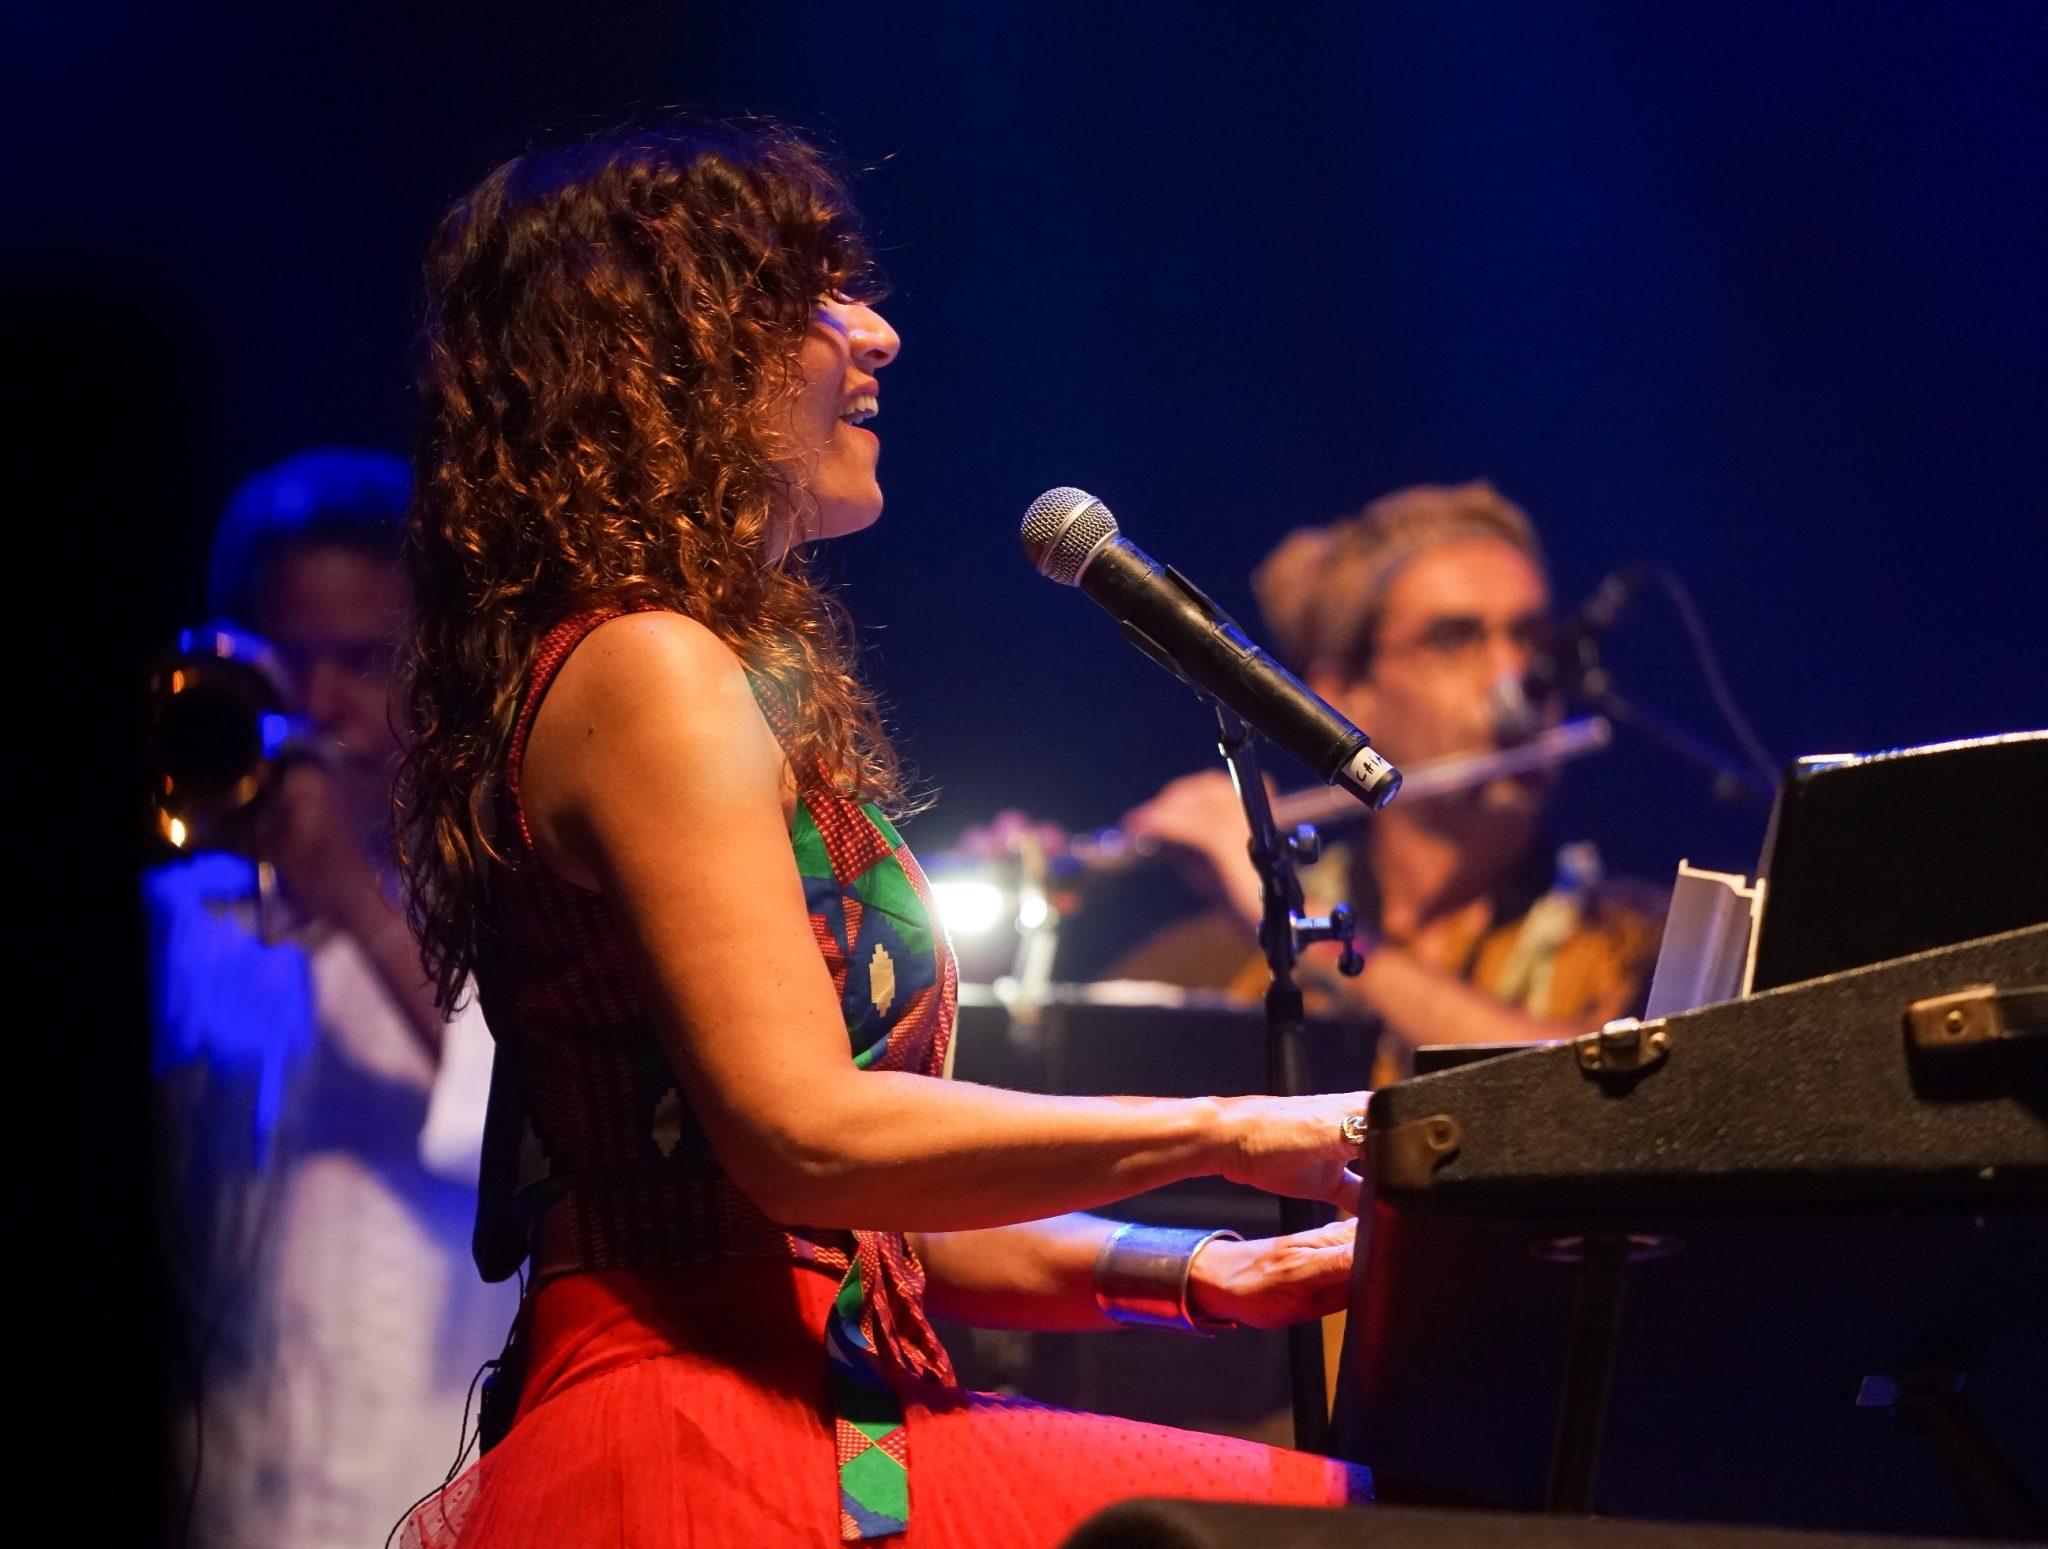 A música italiana Chiara Civello sentada ao piano durante o concerto Refavela 40